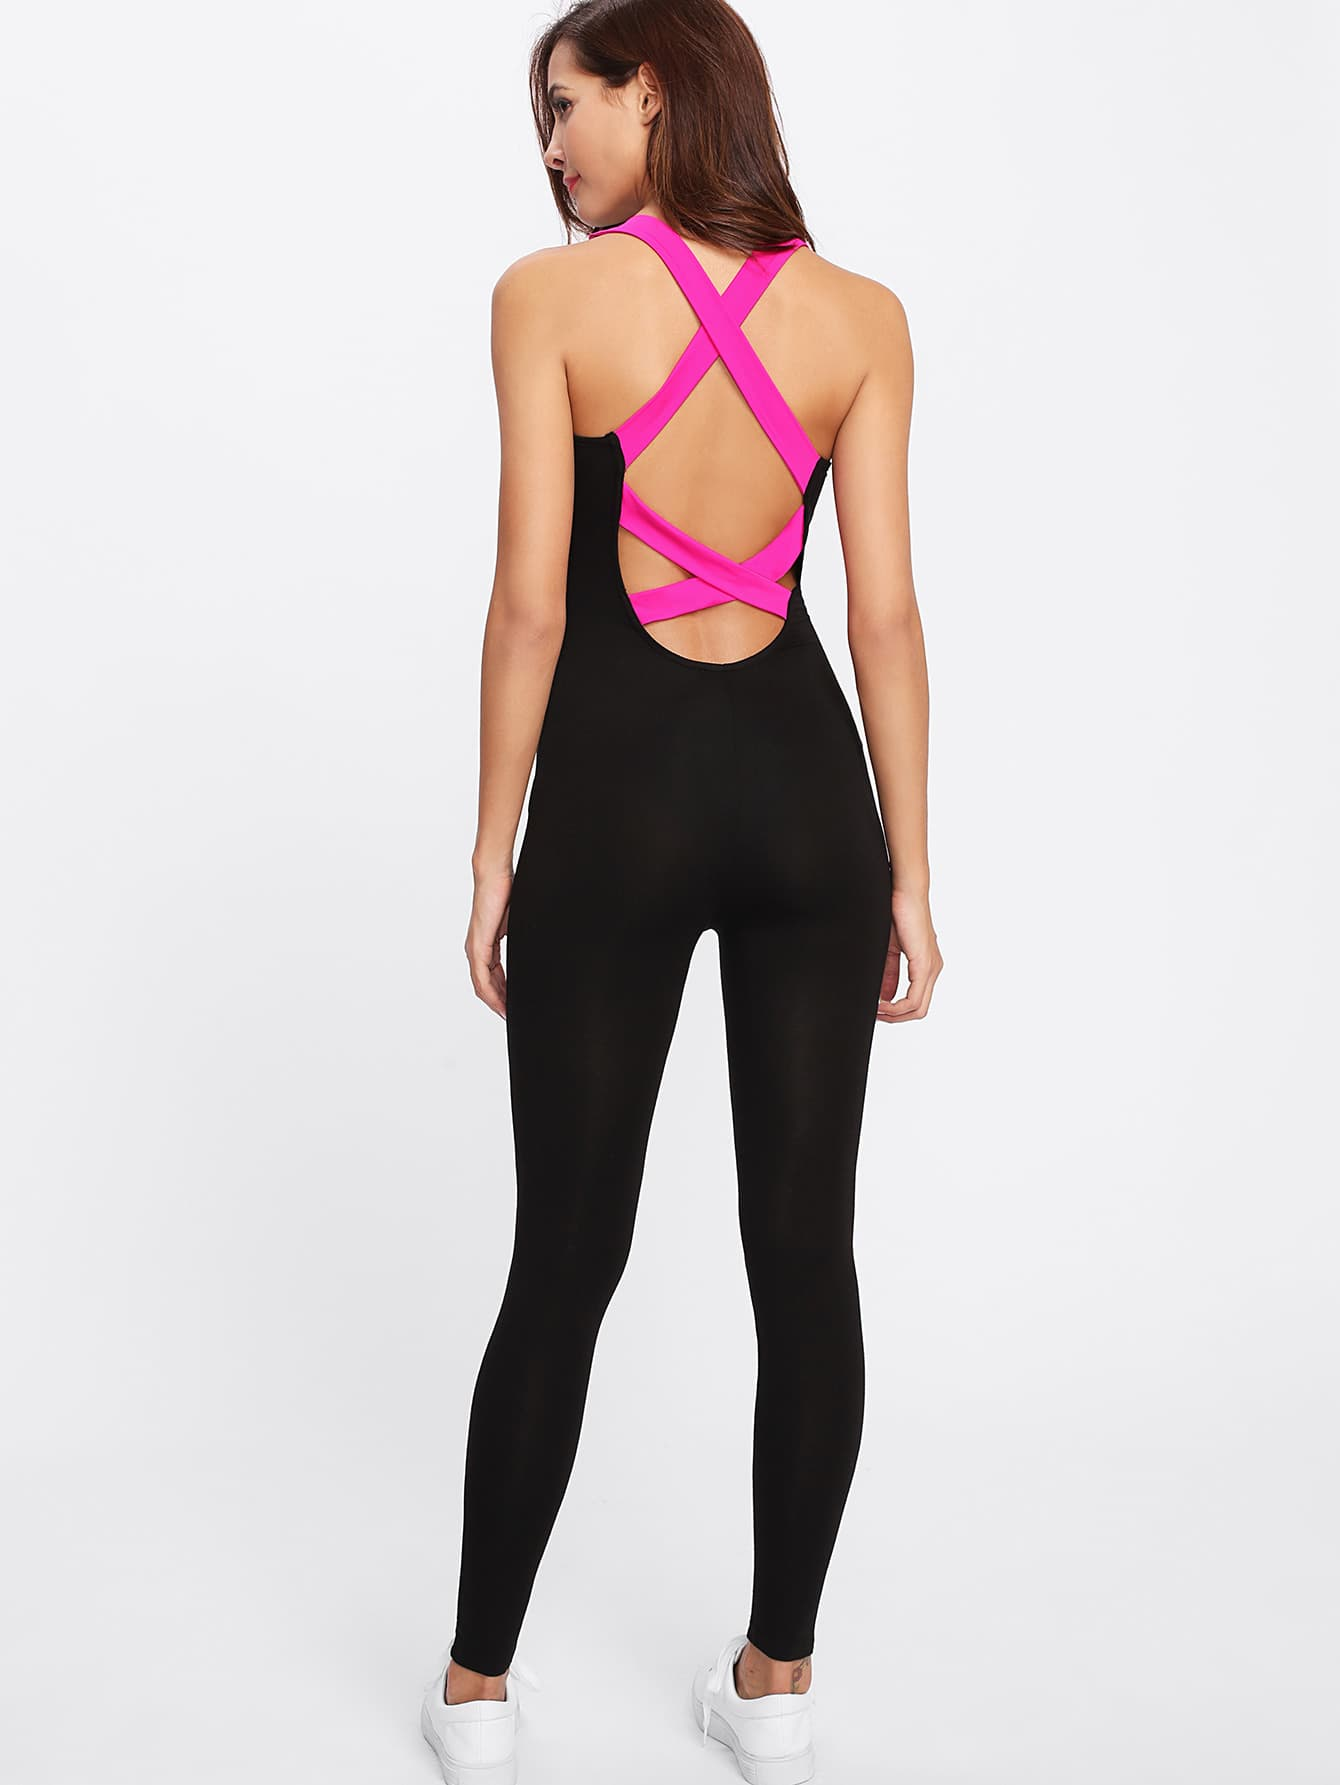 Contrast Crisscross Back Unitard Jumpsuit contrast binding caged back marled unitard jumpsuit